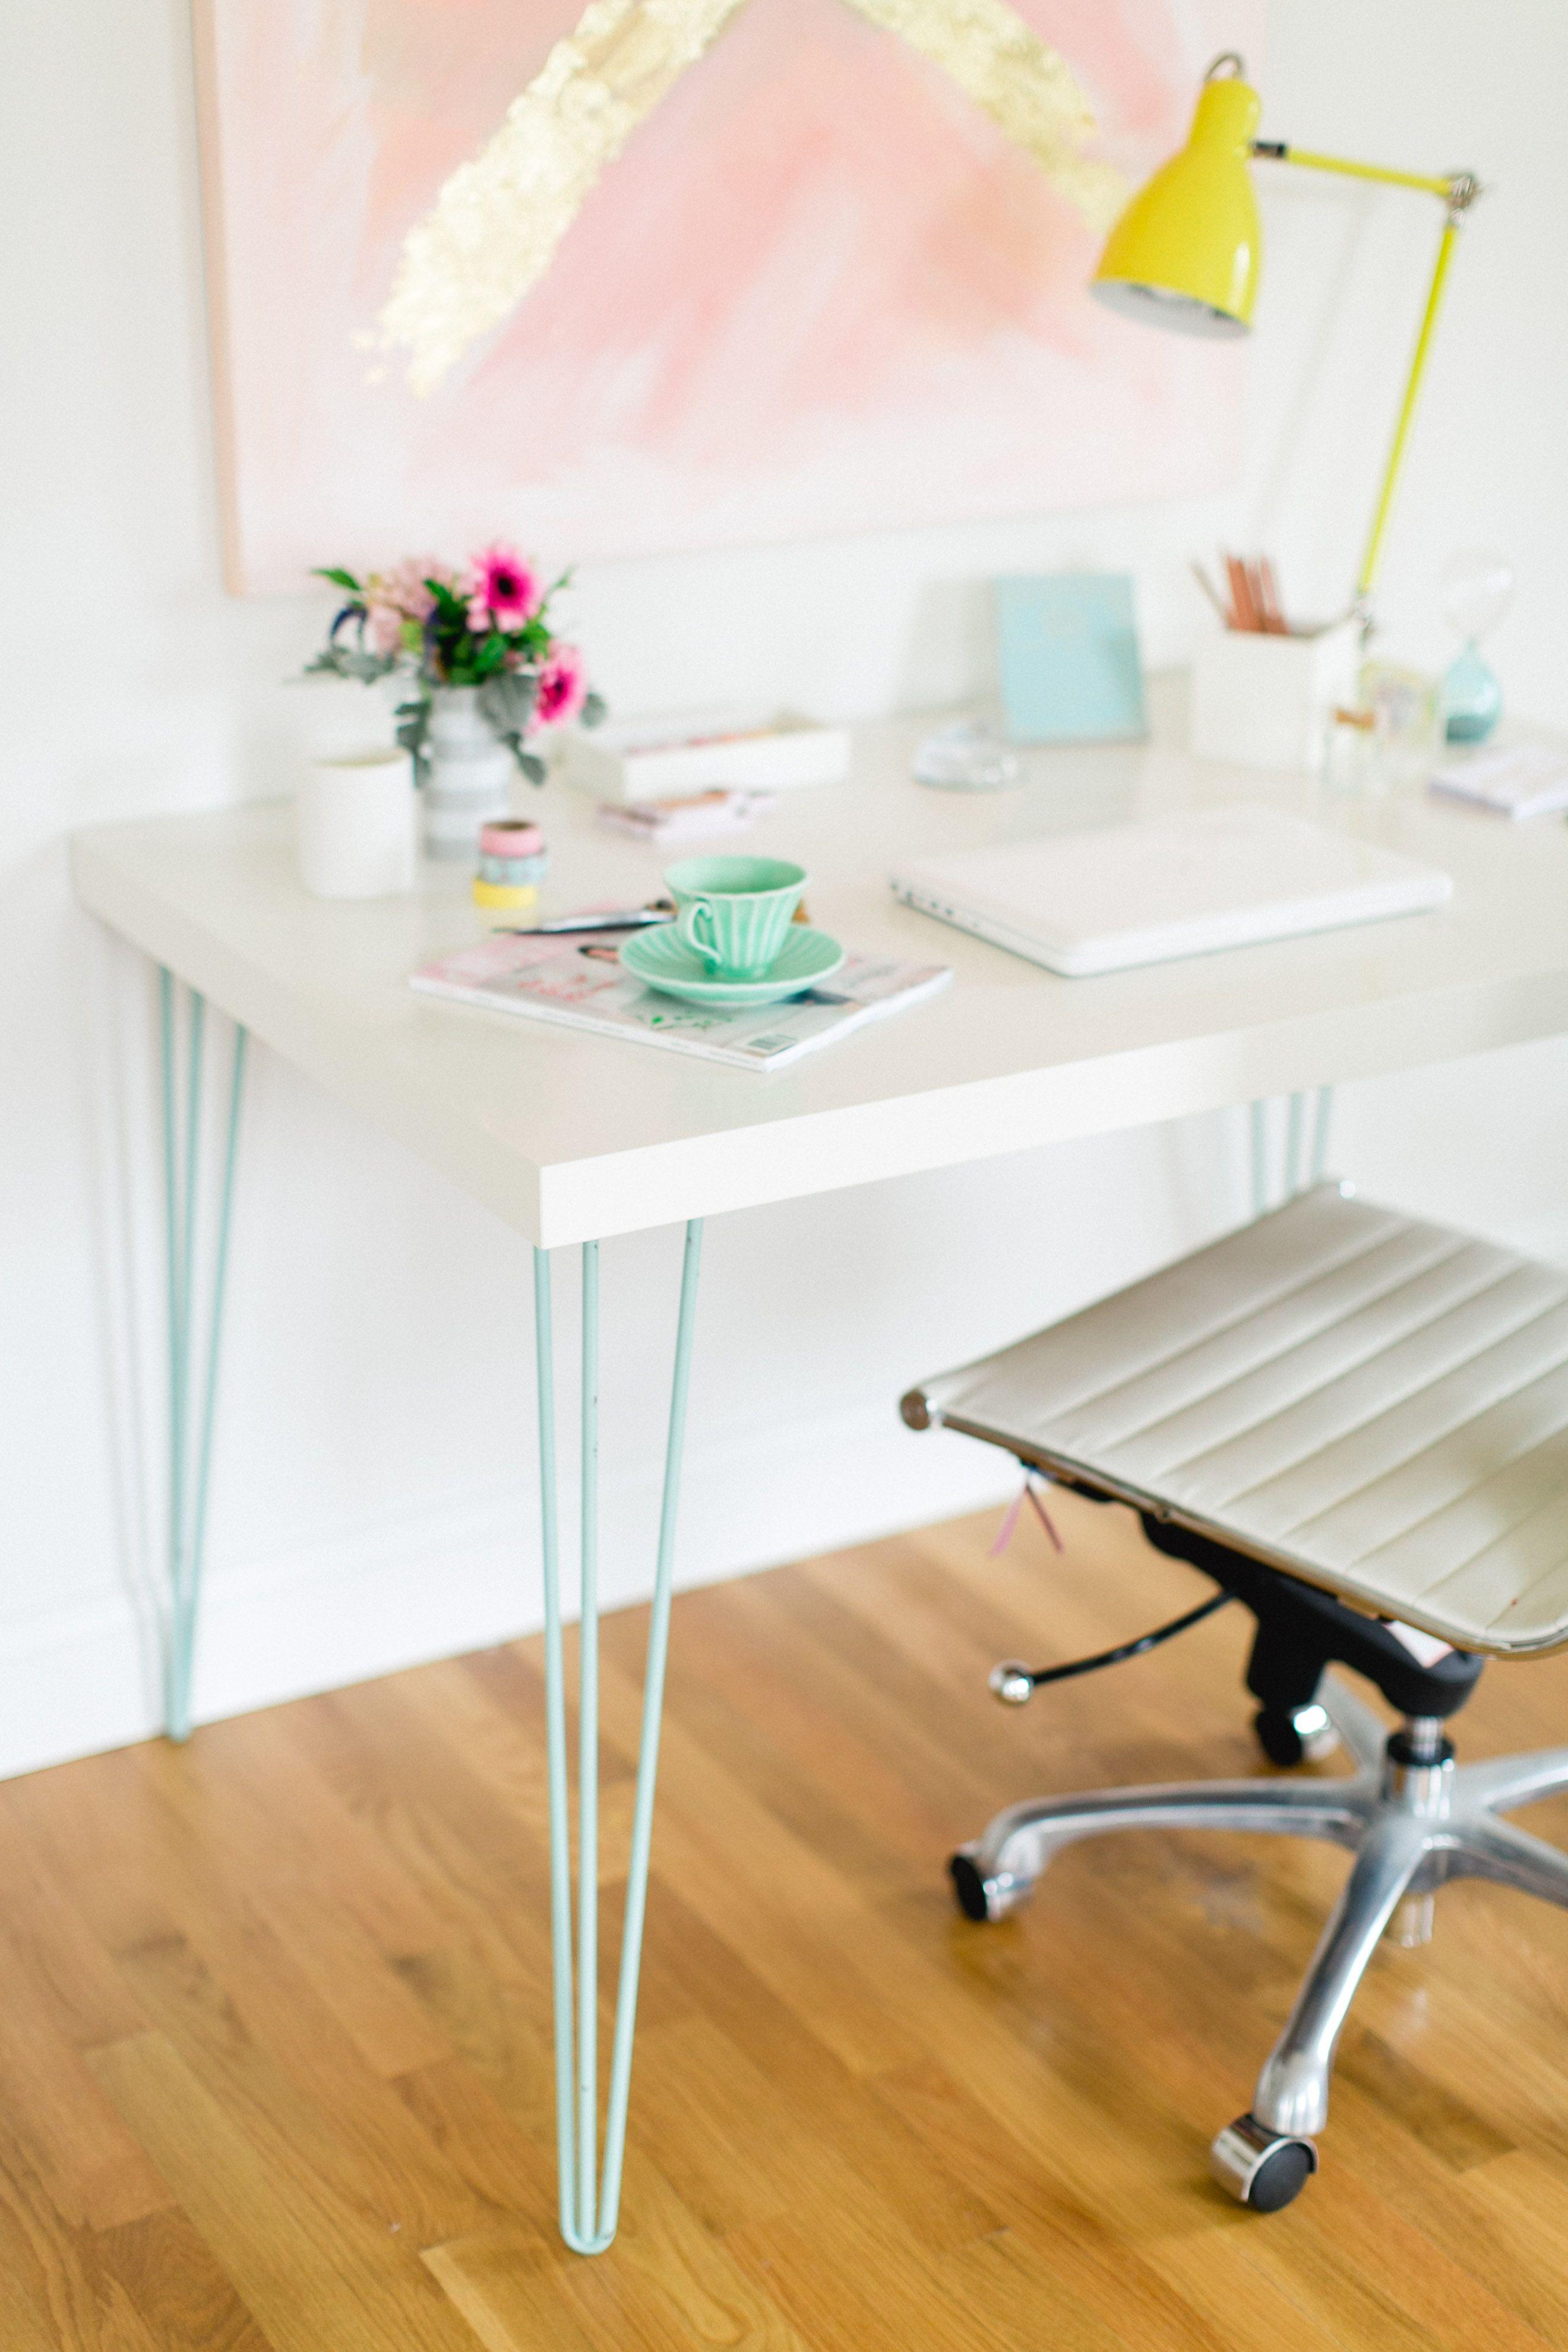 ikea hack modern desk ikea hacks ikea desk diy desk desk hacks rh pinterest com